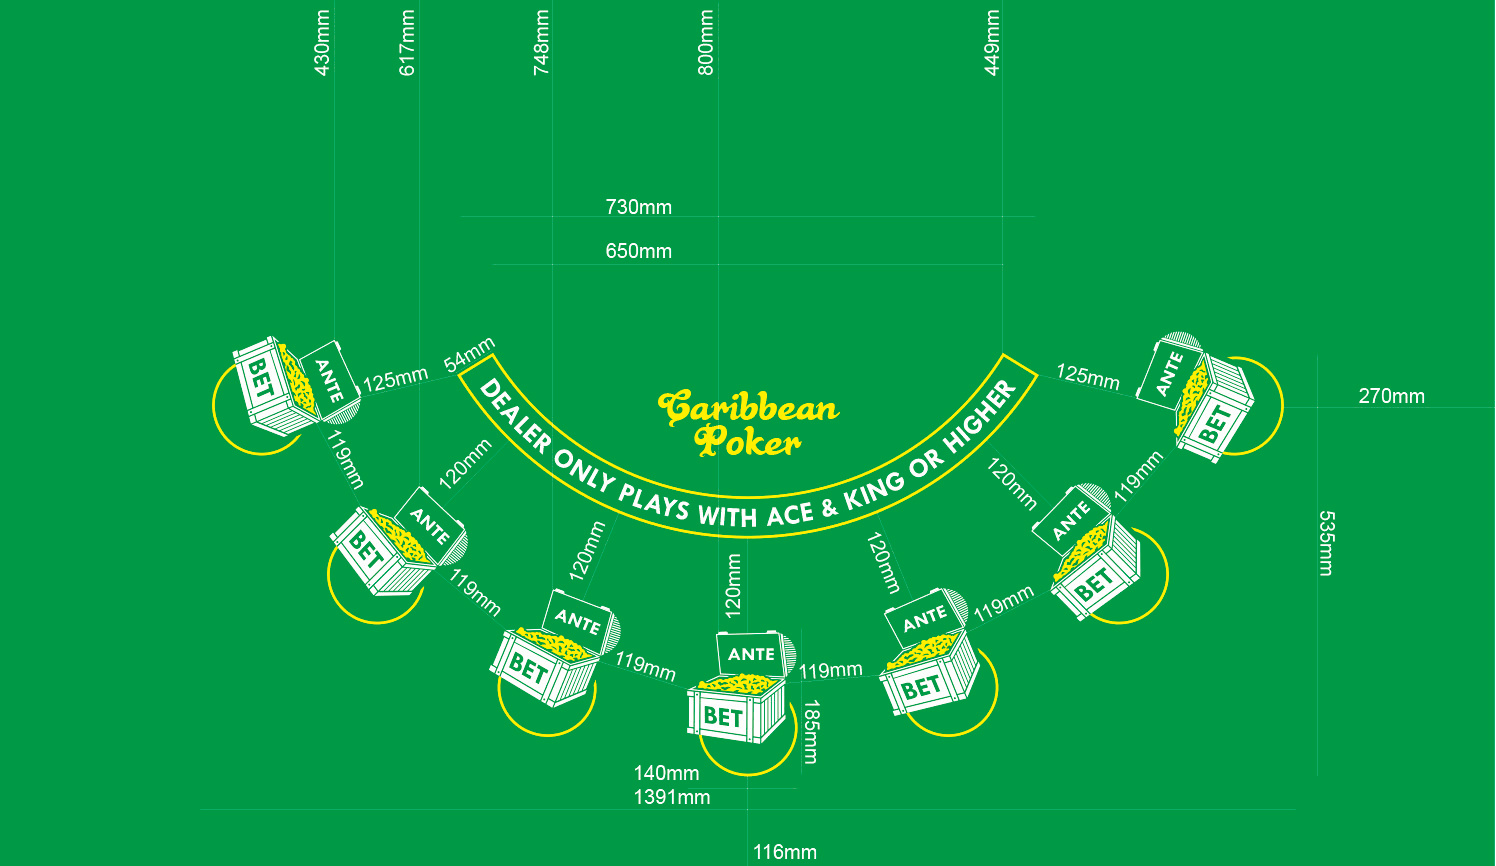 caribbean Poker 1900x1100